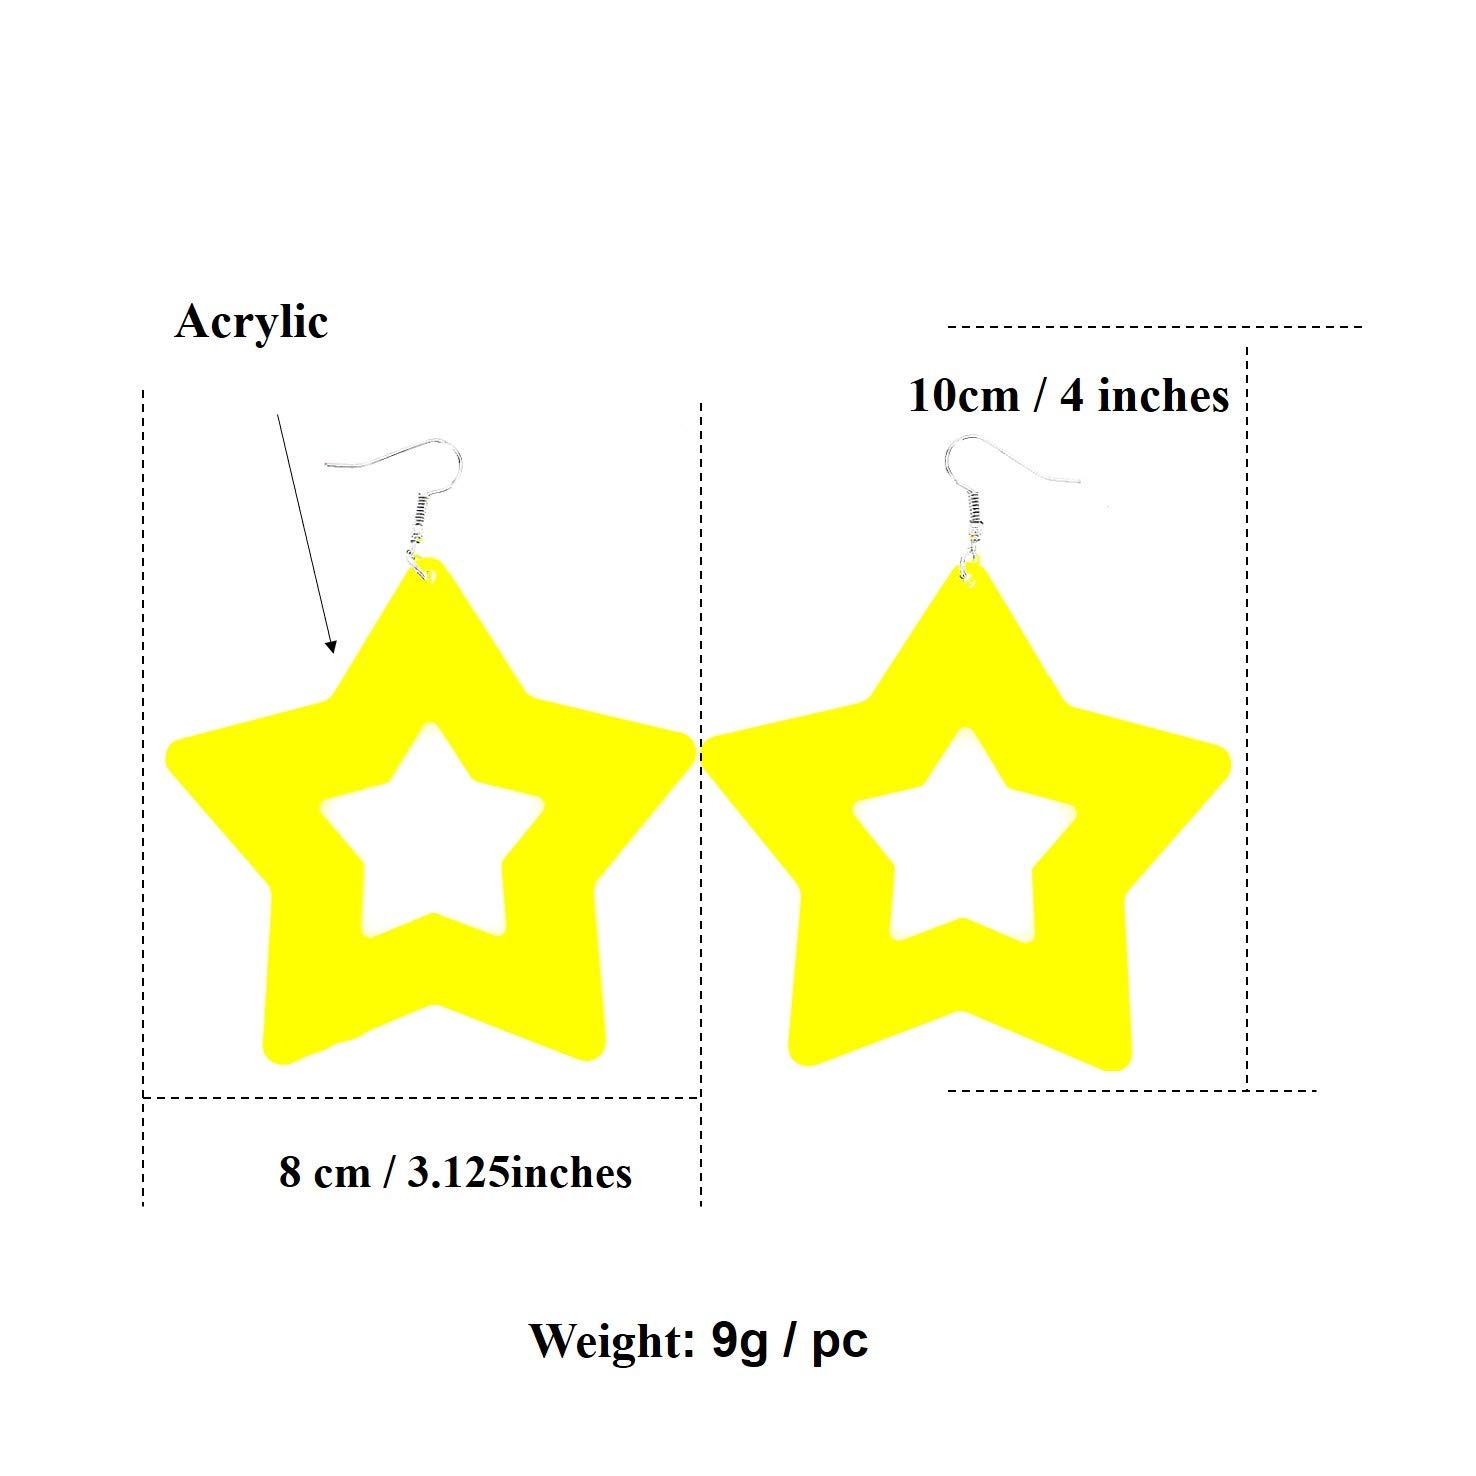 Lightweight Drop Acrylic 80s Party Earrings Fashion Neon Color Star Earrings for Women Girls